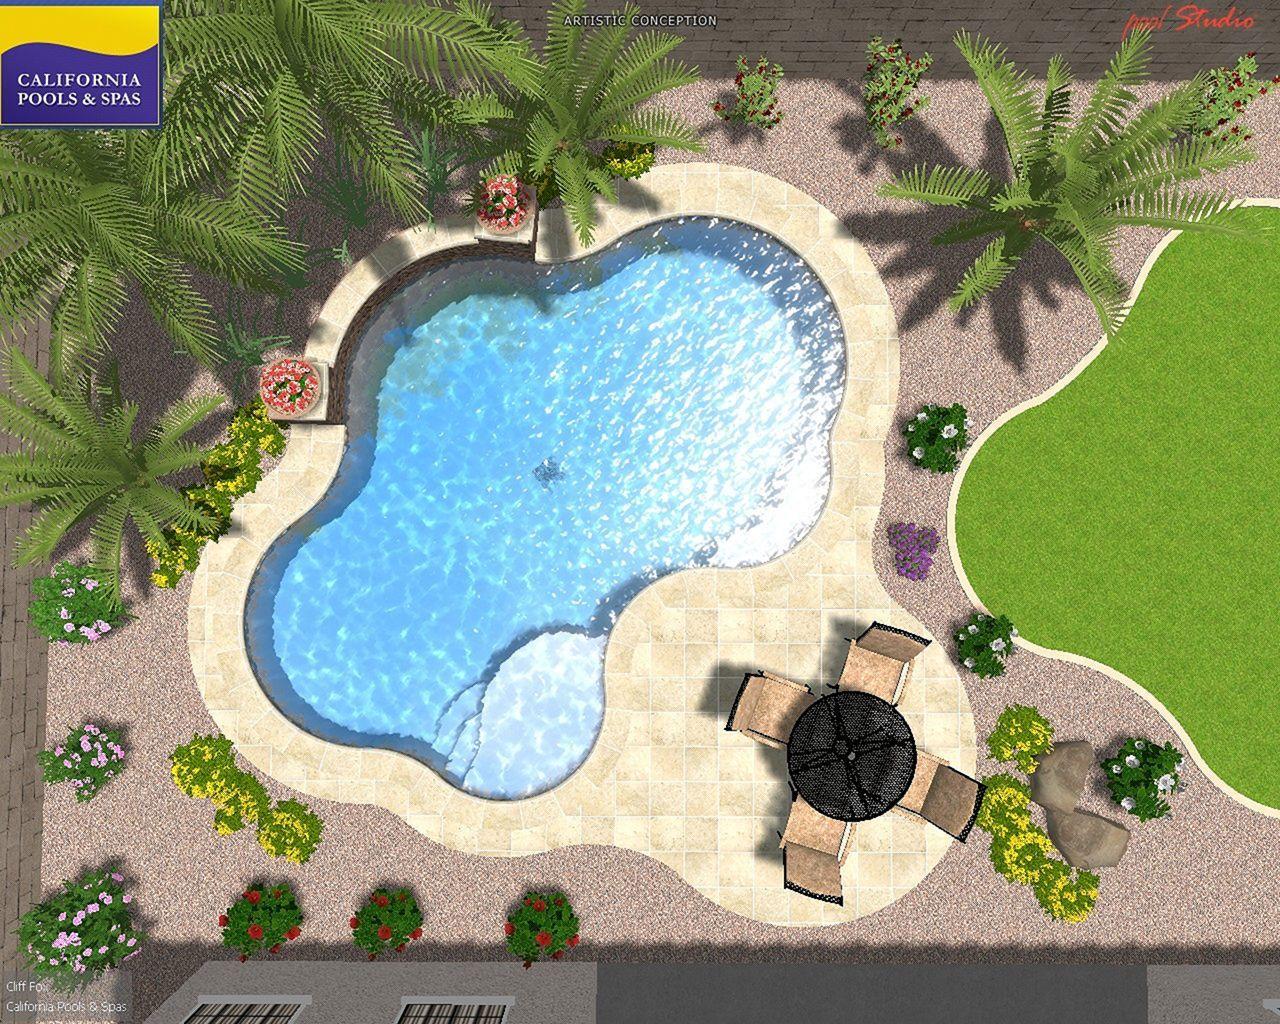 The Best 45 Incredible Kids Swimming Pool Design Ideas To Make Your Kids Happy Https Decoredo Pool Designs Backyard Pool Landscaping Children Swimming Pool